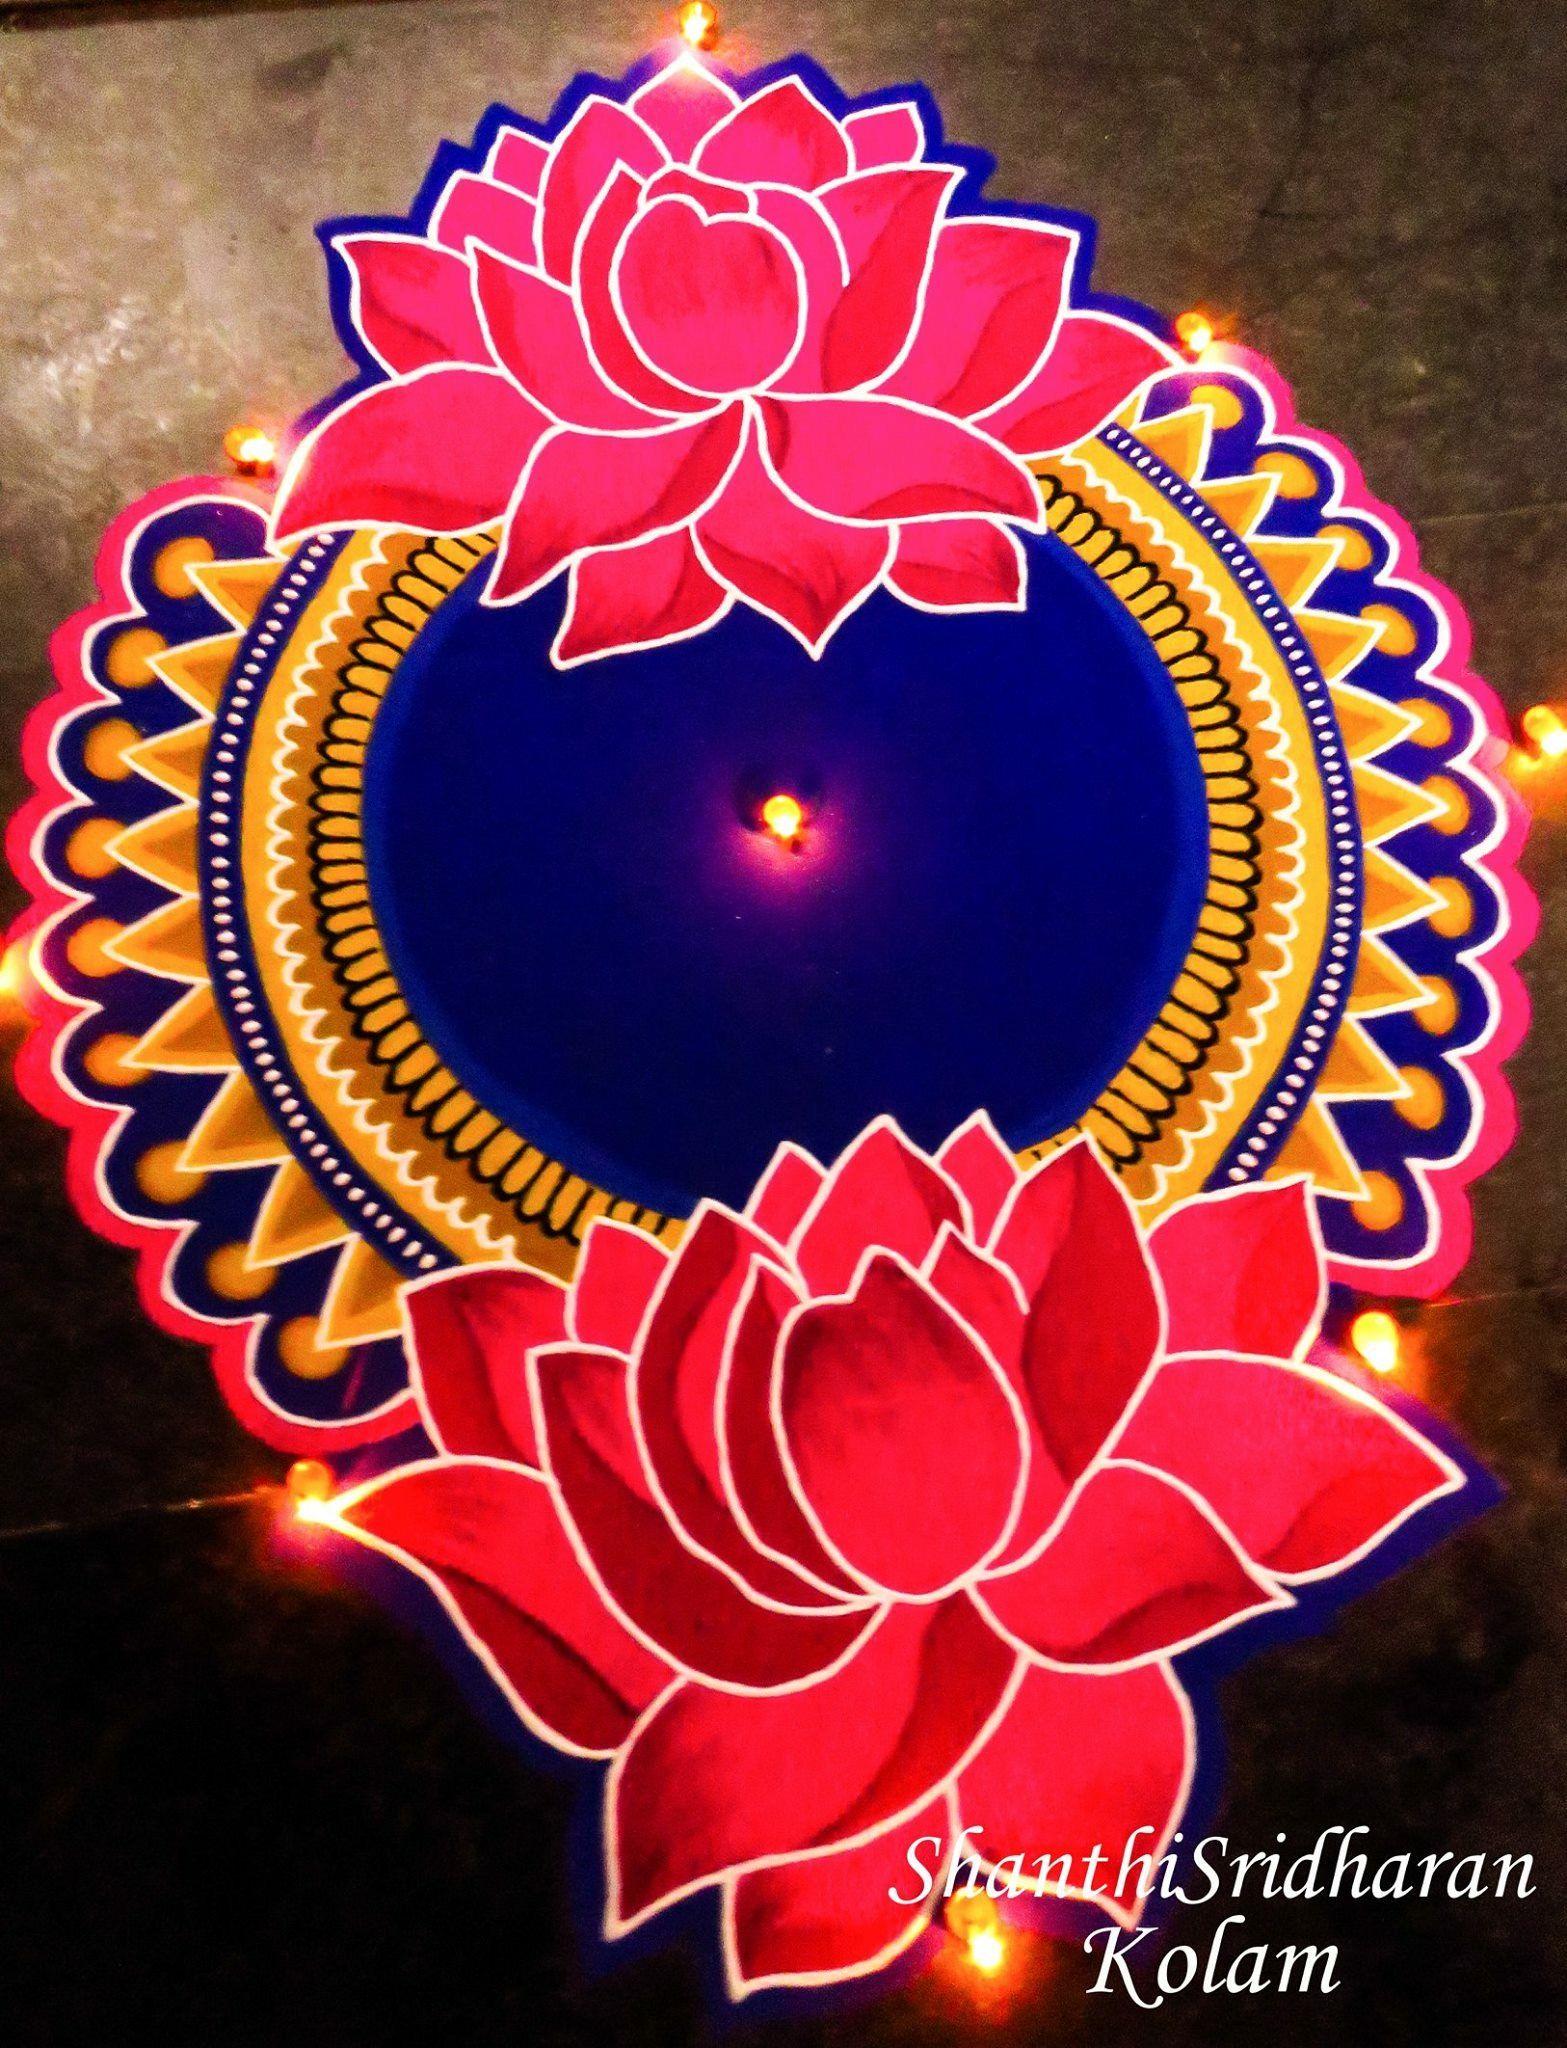 Pin By Aaron Rajput On Rang Rangoli Designs Diwali Rangoli